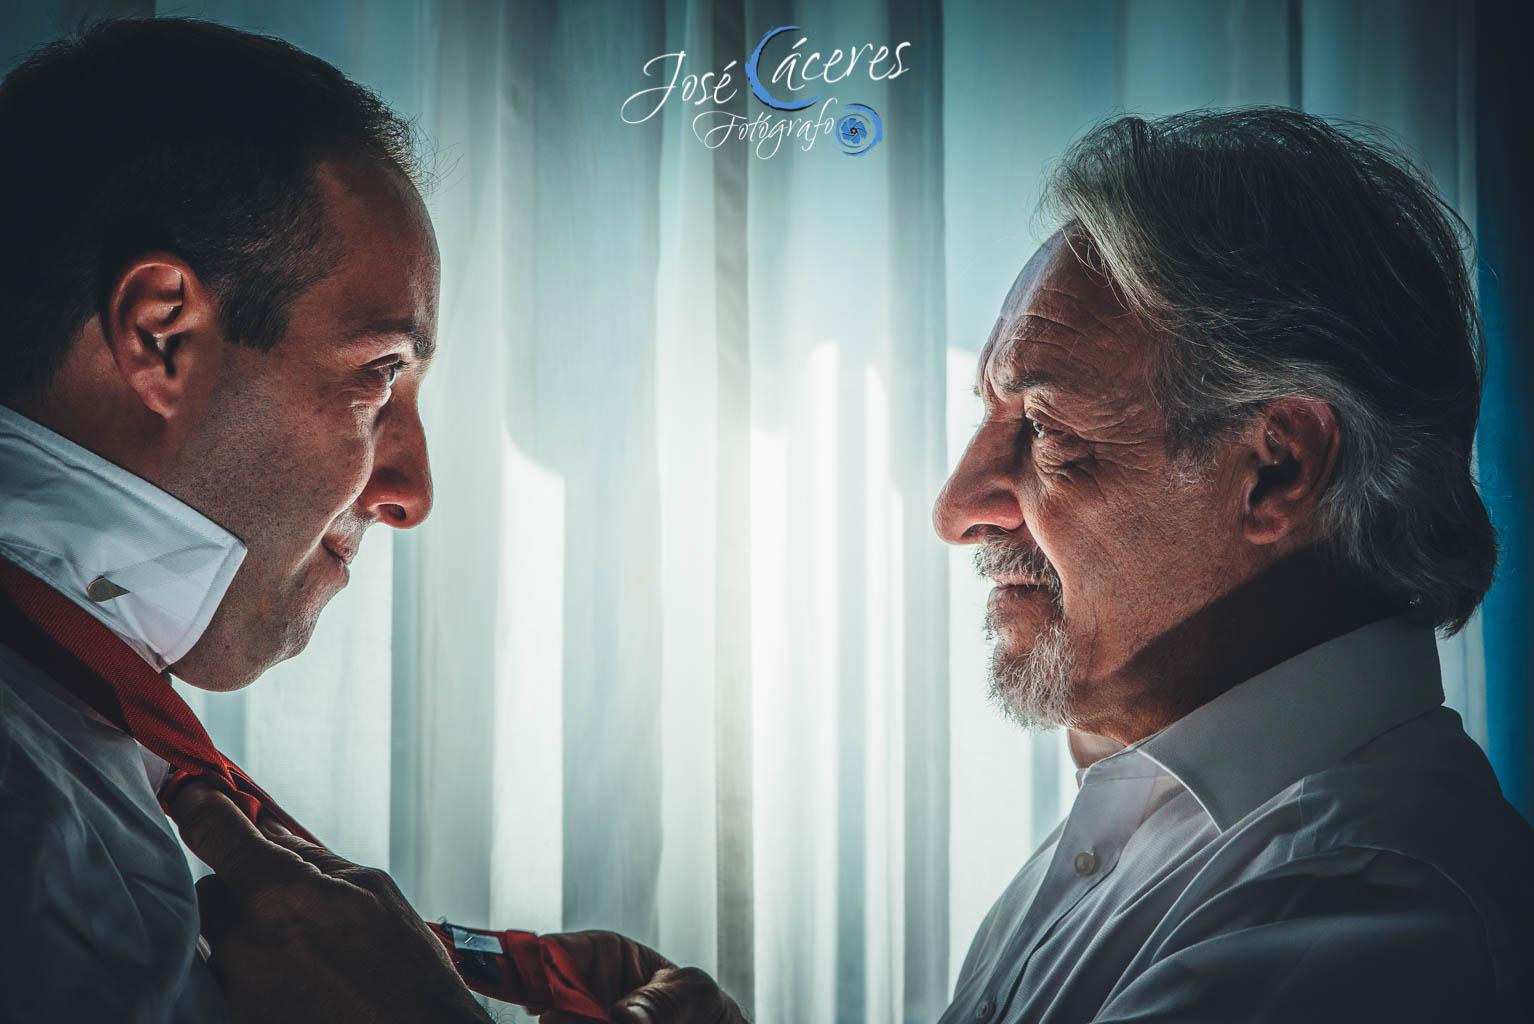 Boda Civil, Punto Mágico en La Barrosa, fotografia de Jose Caceres-1